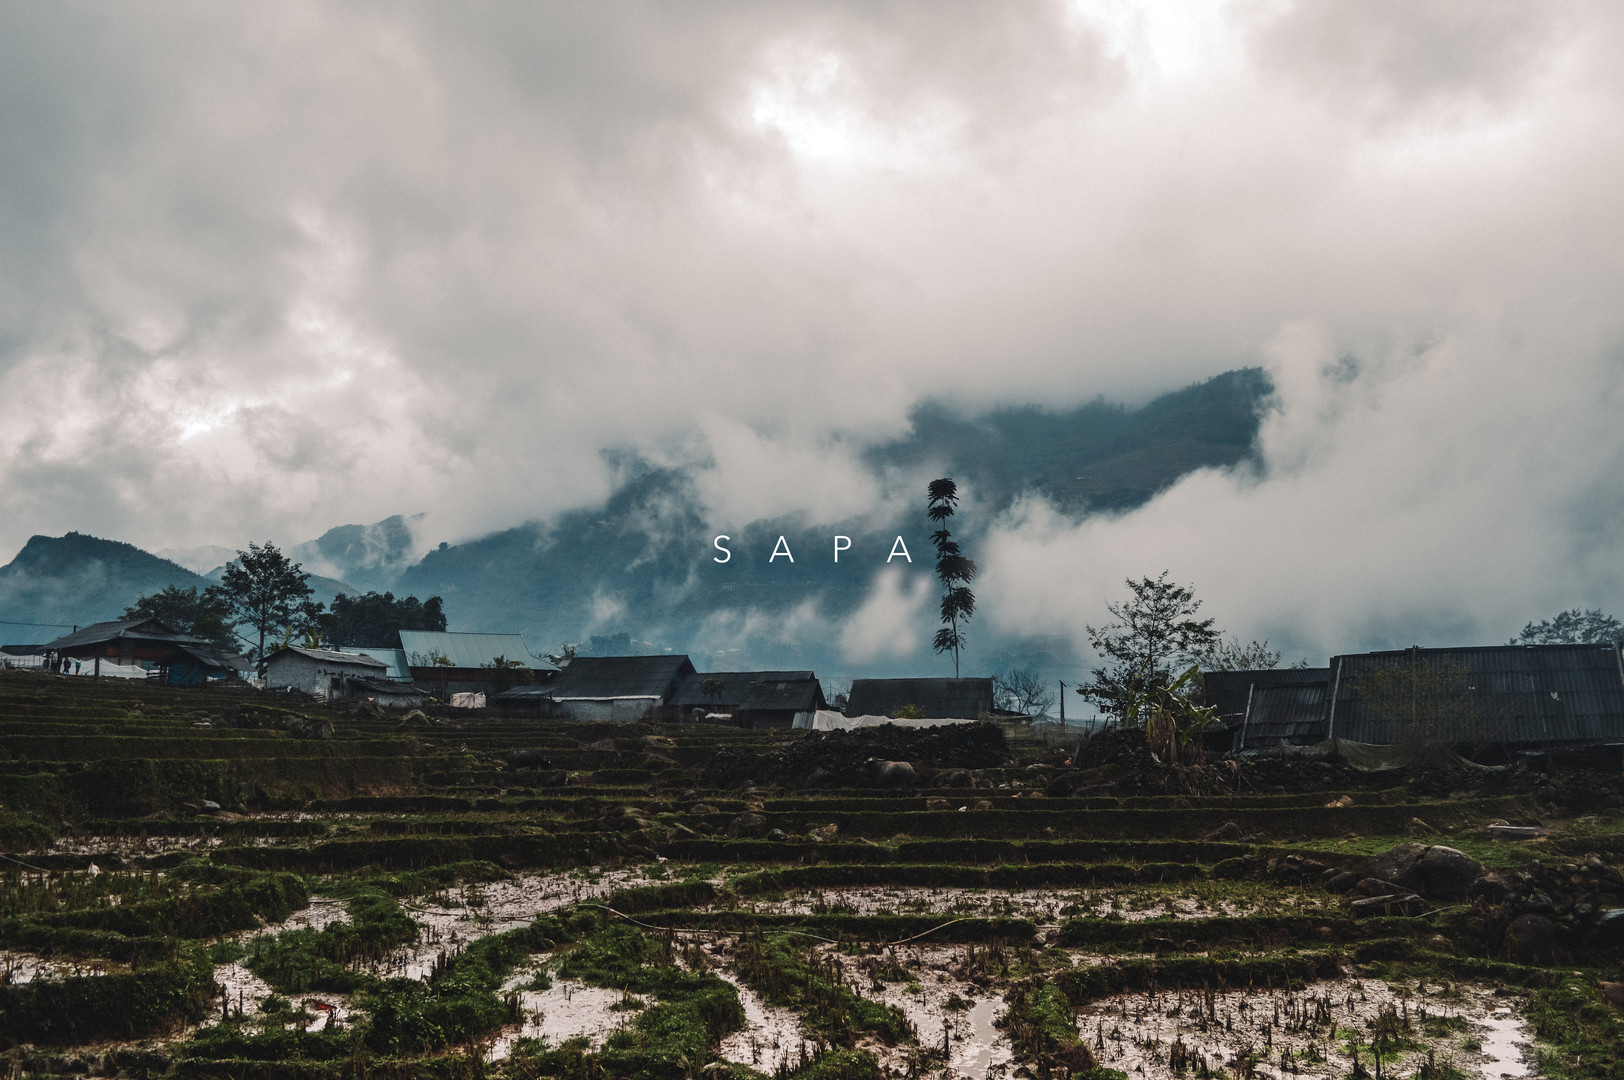 Rice Fields of Sapa